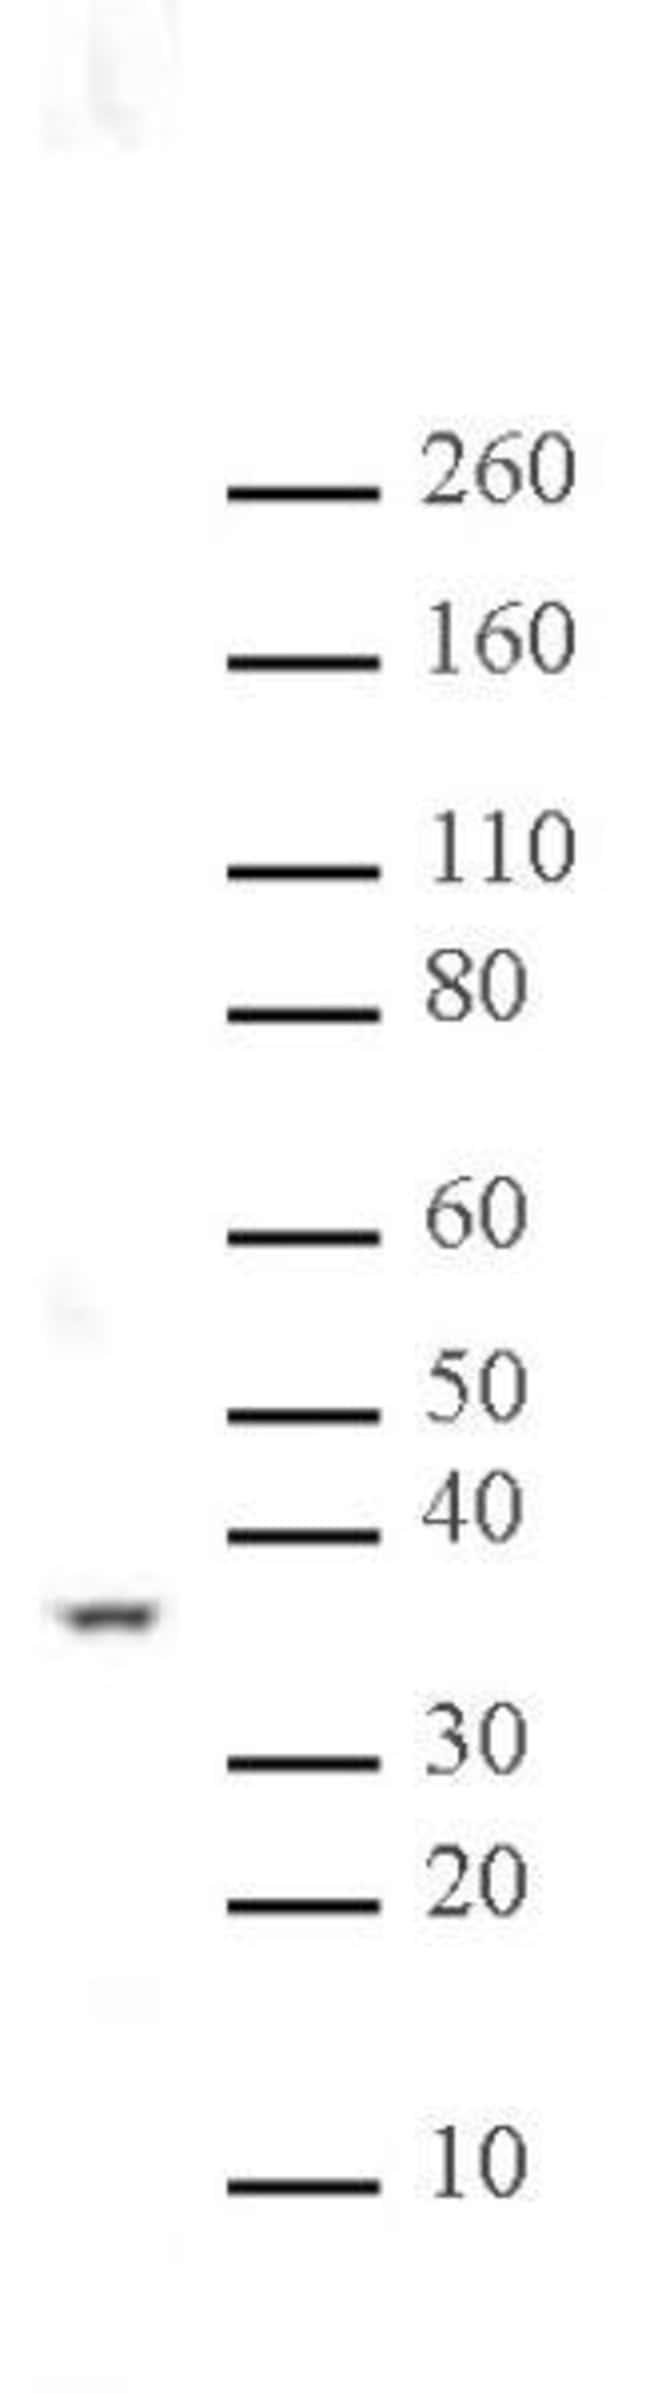 PP2A Rabbit anti-Human, Mouse, Rat, Unconjugated, Polyclonal, Active Motif:Antibodies:Primary